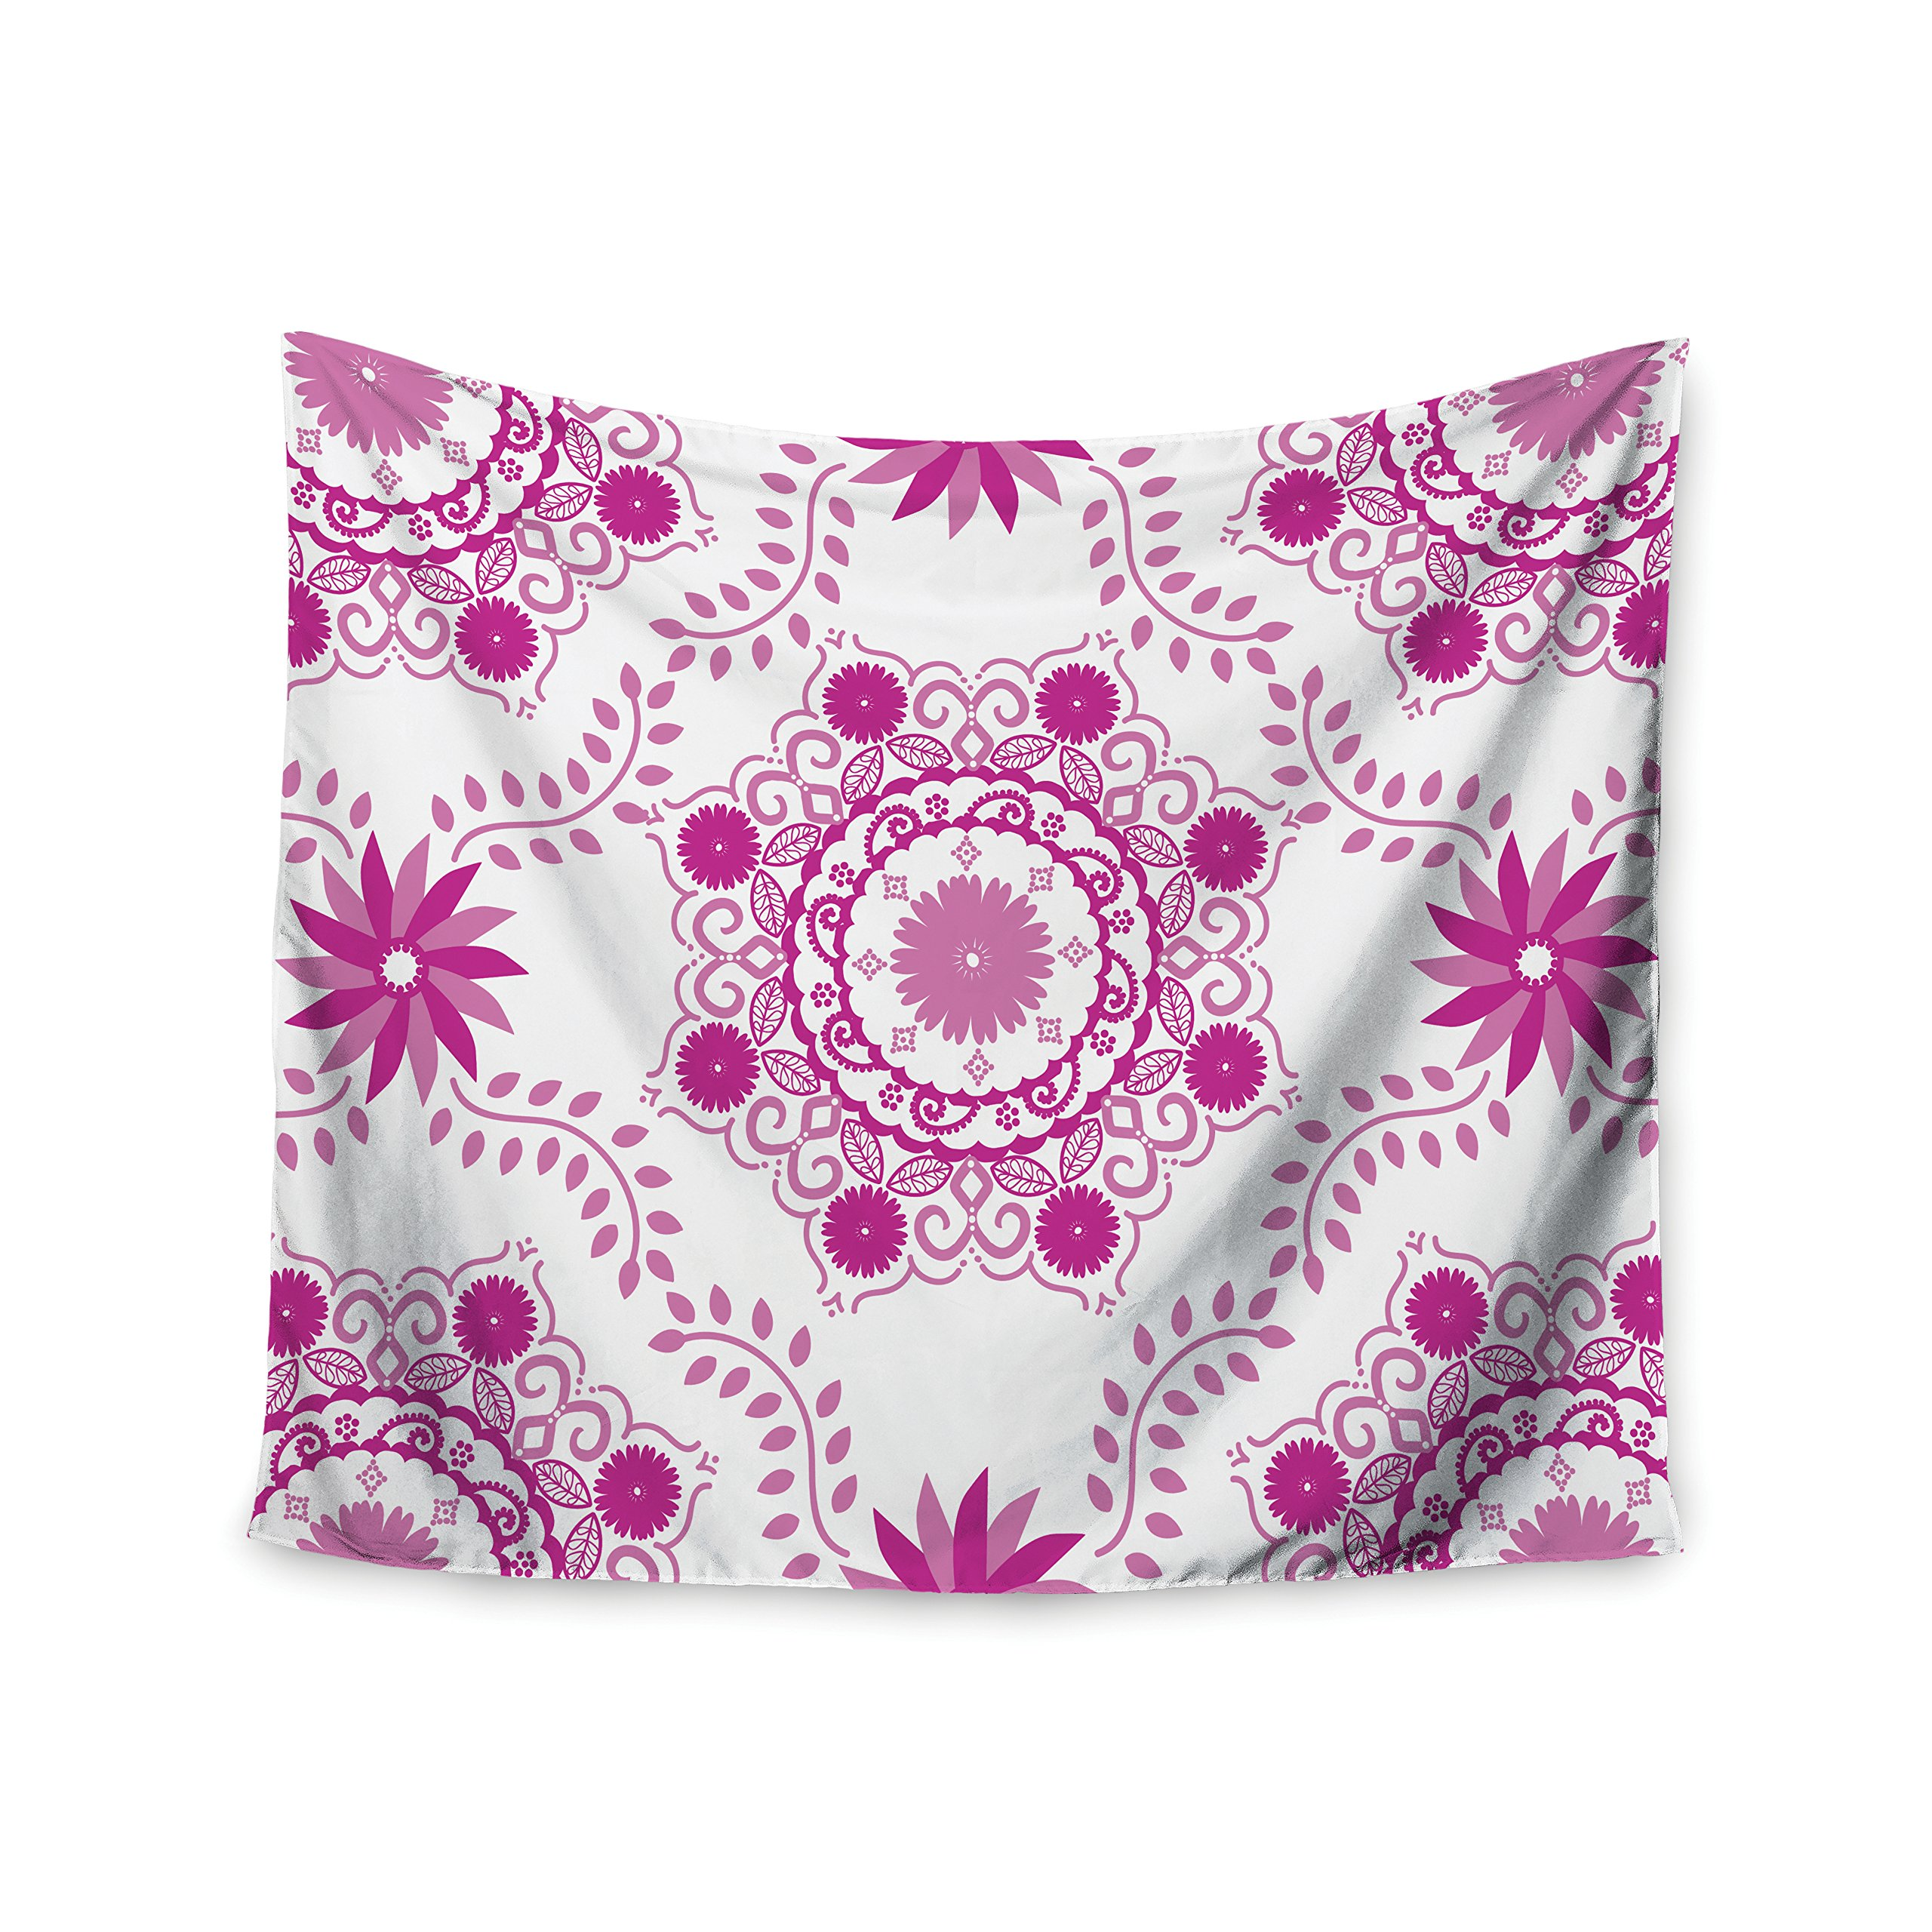 KESS InHouse Anneline Sophia ''Let's Dance Fuschia'' Pink Floral Wall Tapestry, 68'' X 80''''